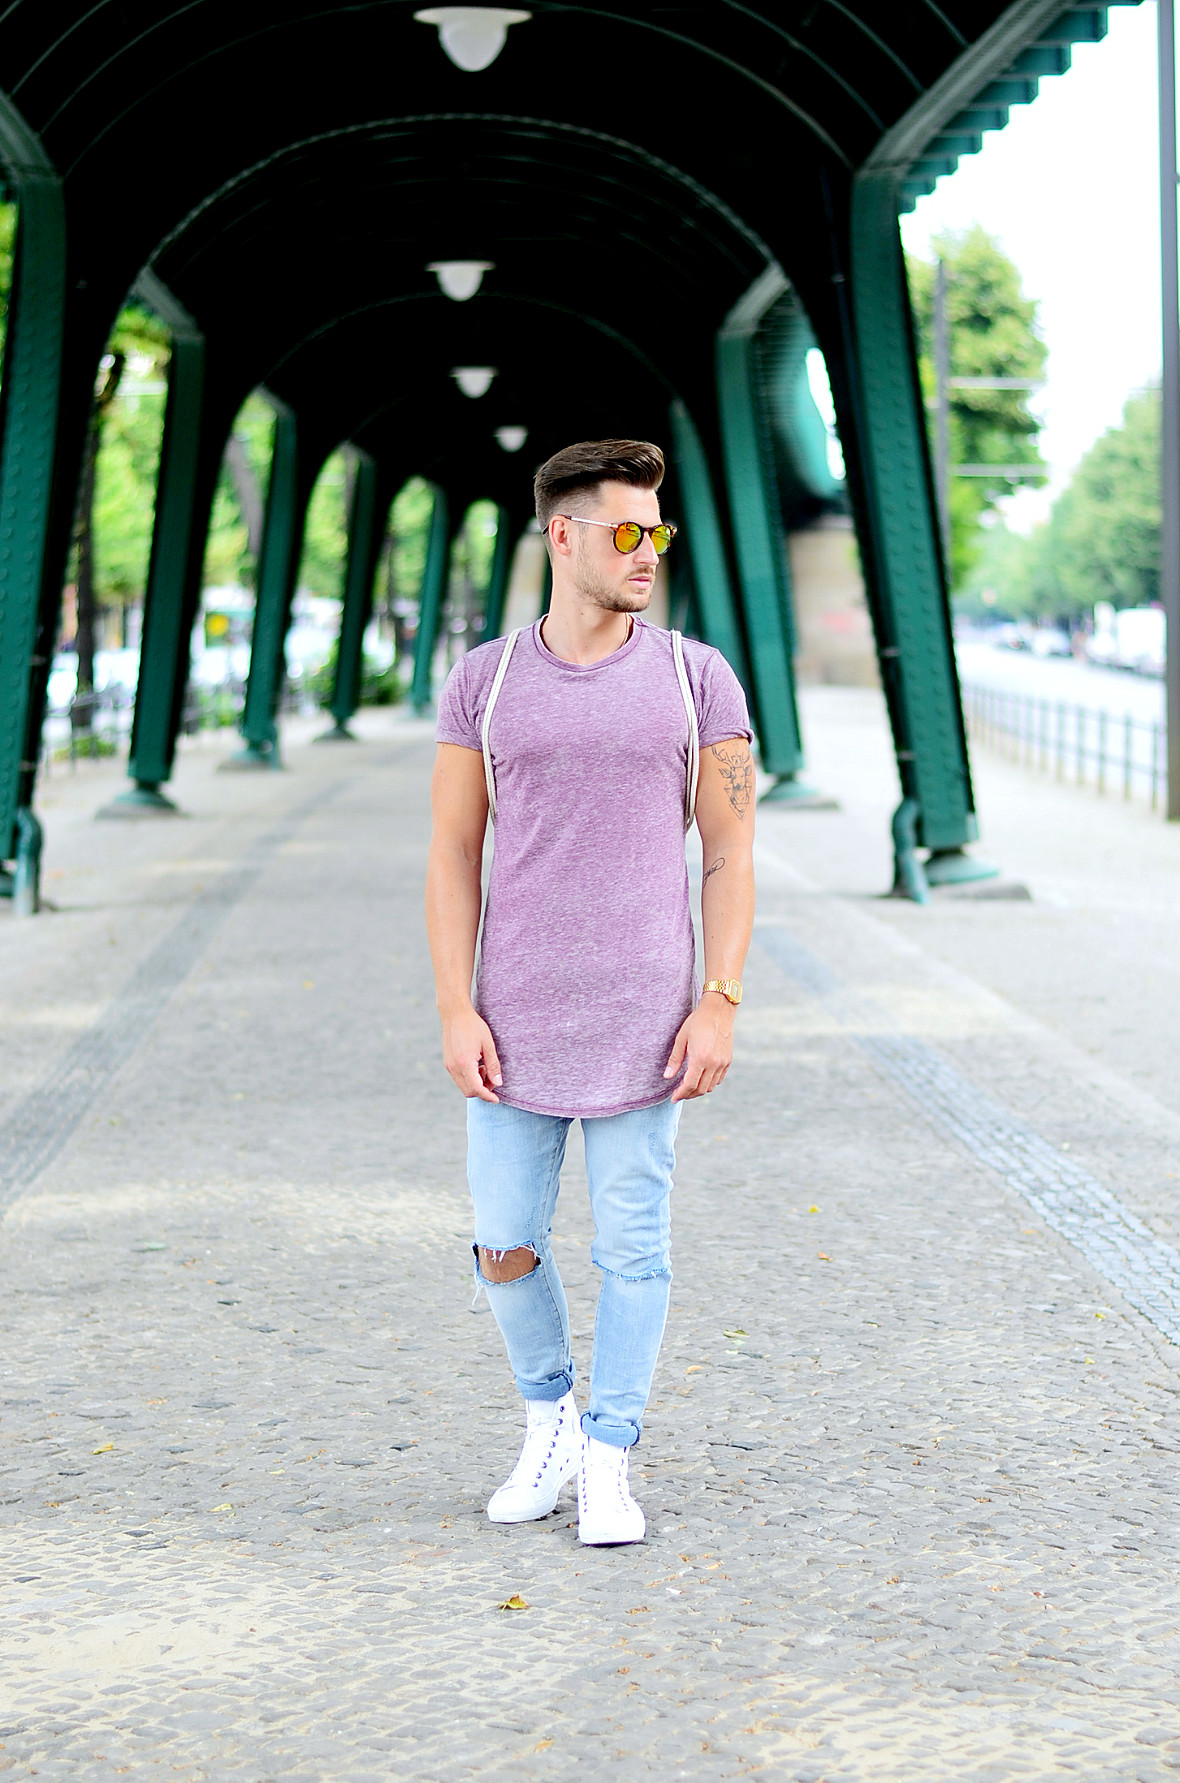 TommeezJerry-Converse-Chucks-weiß-Skinny-Jeans-Longshirt